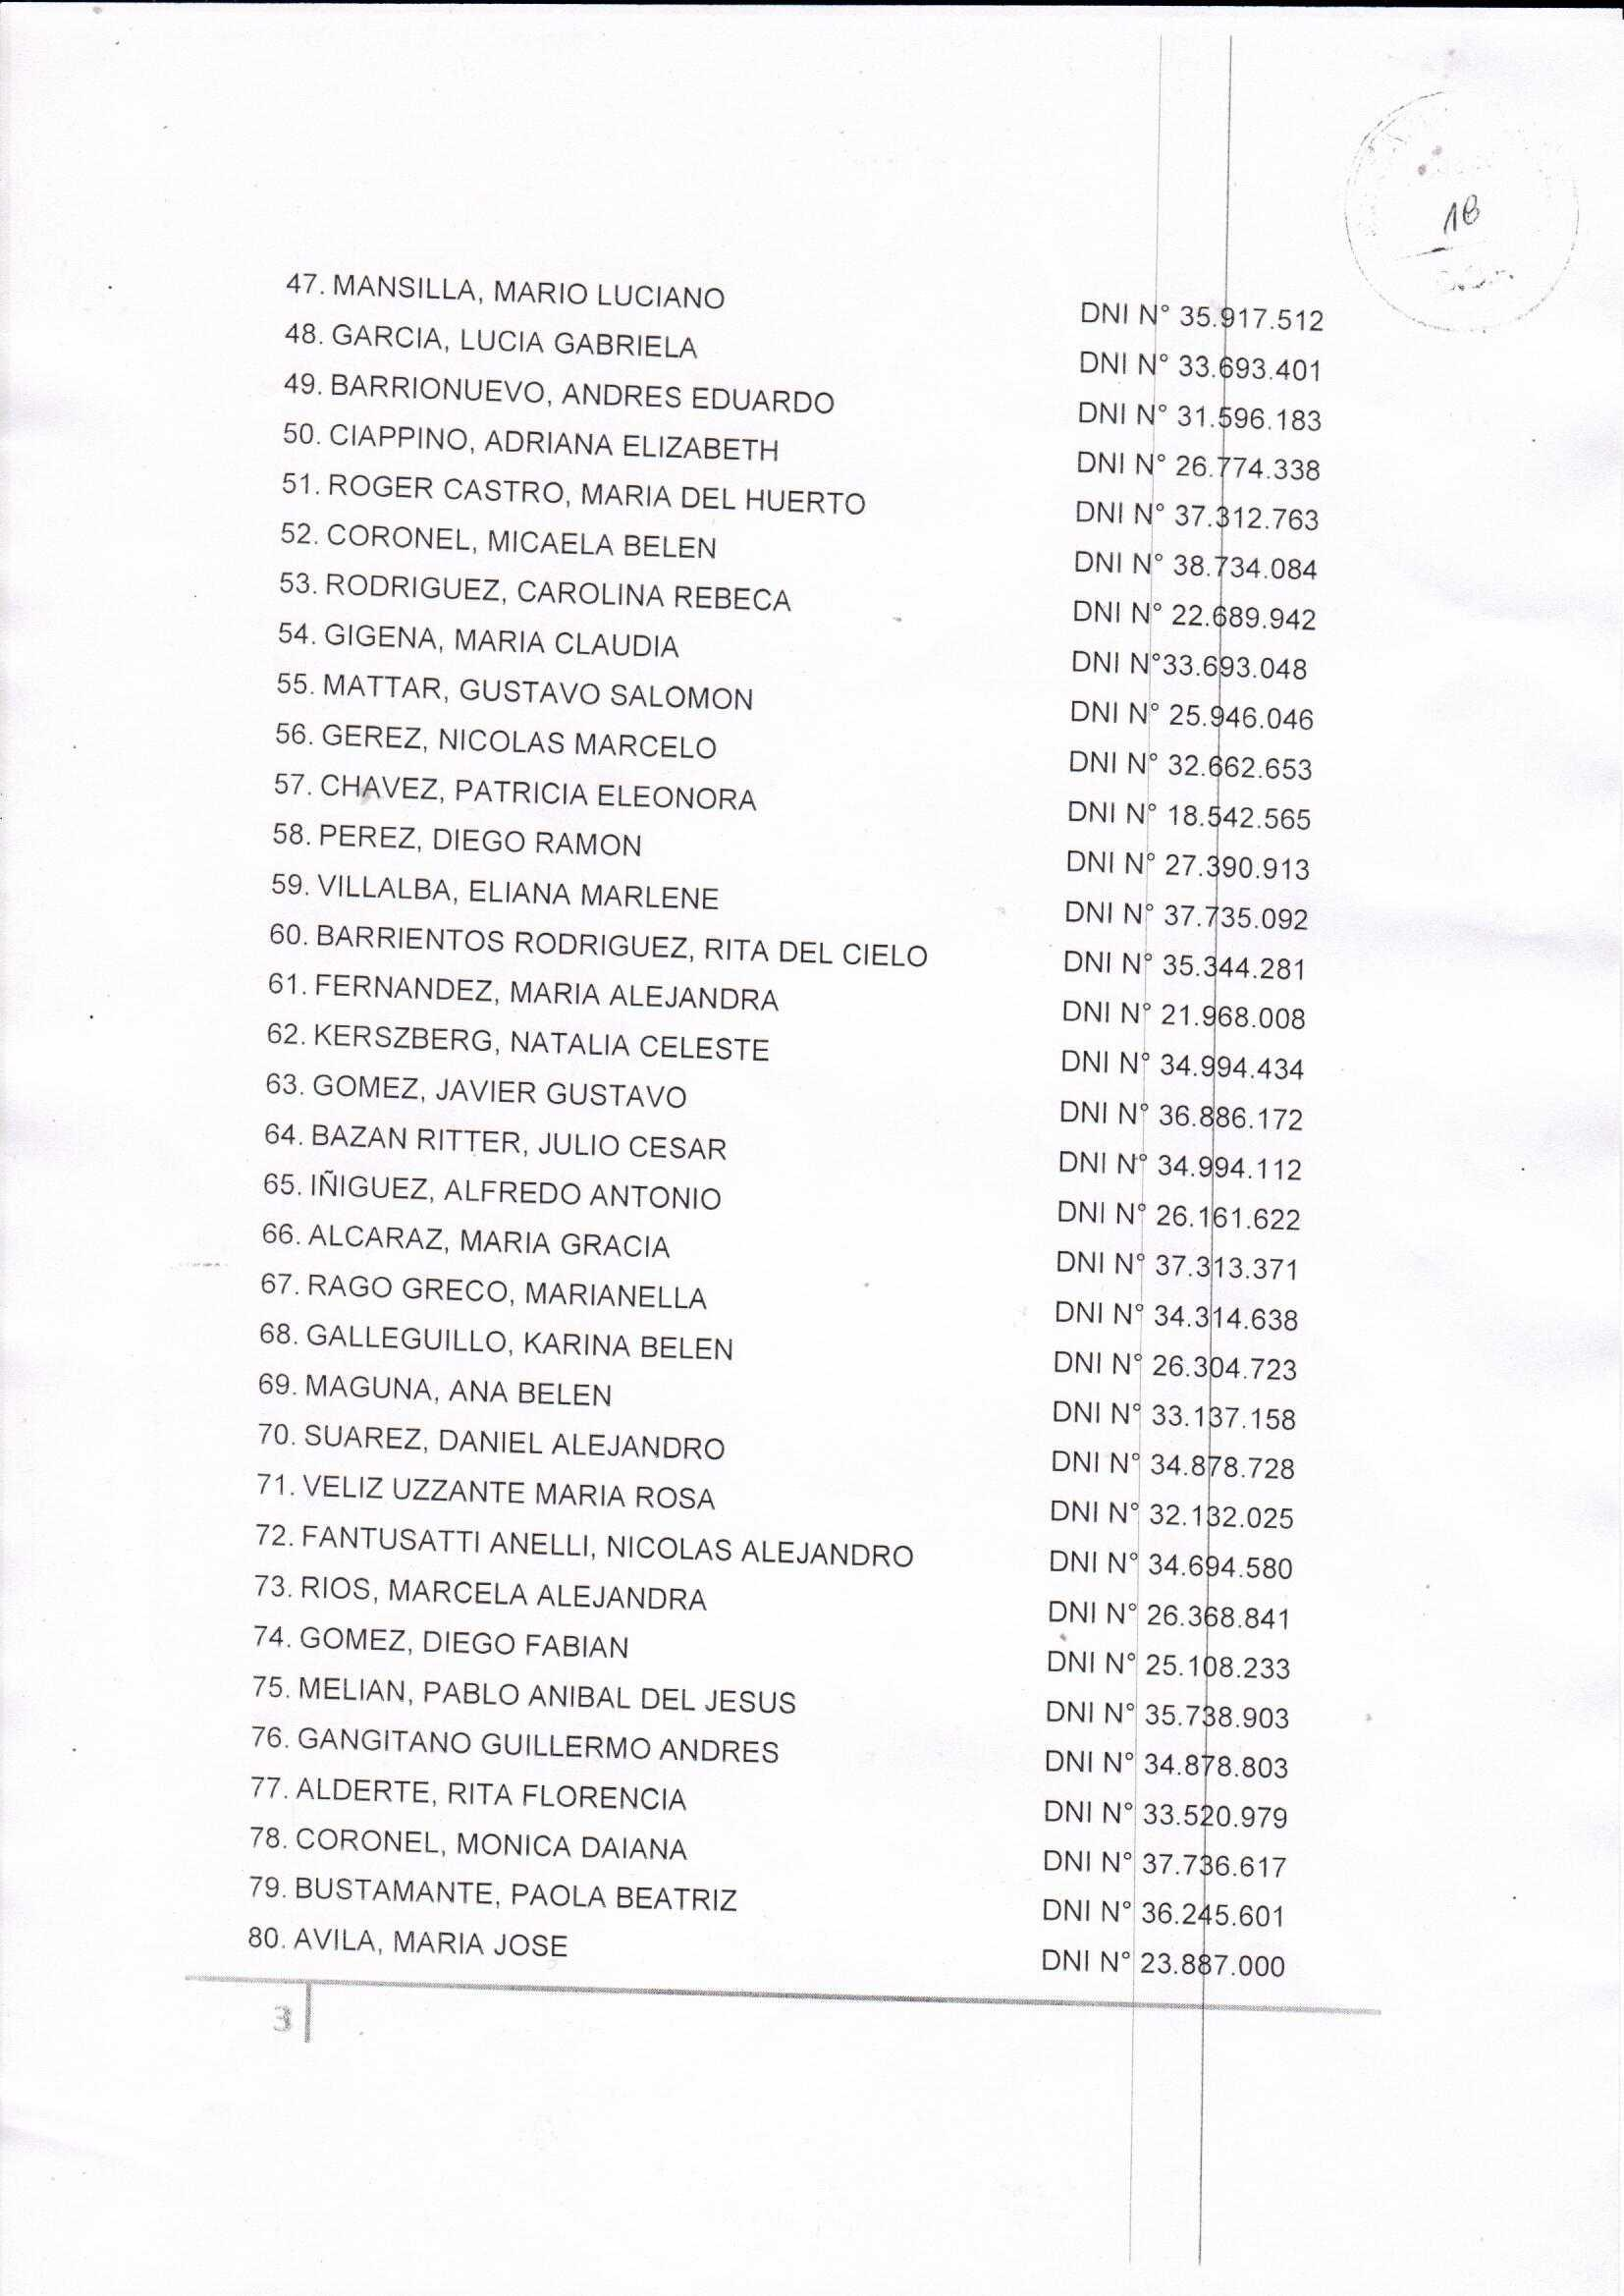 Lista Inscriptos_Página_3